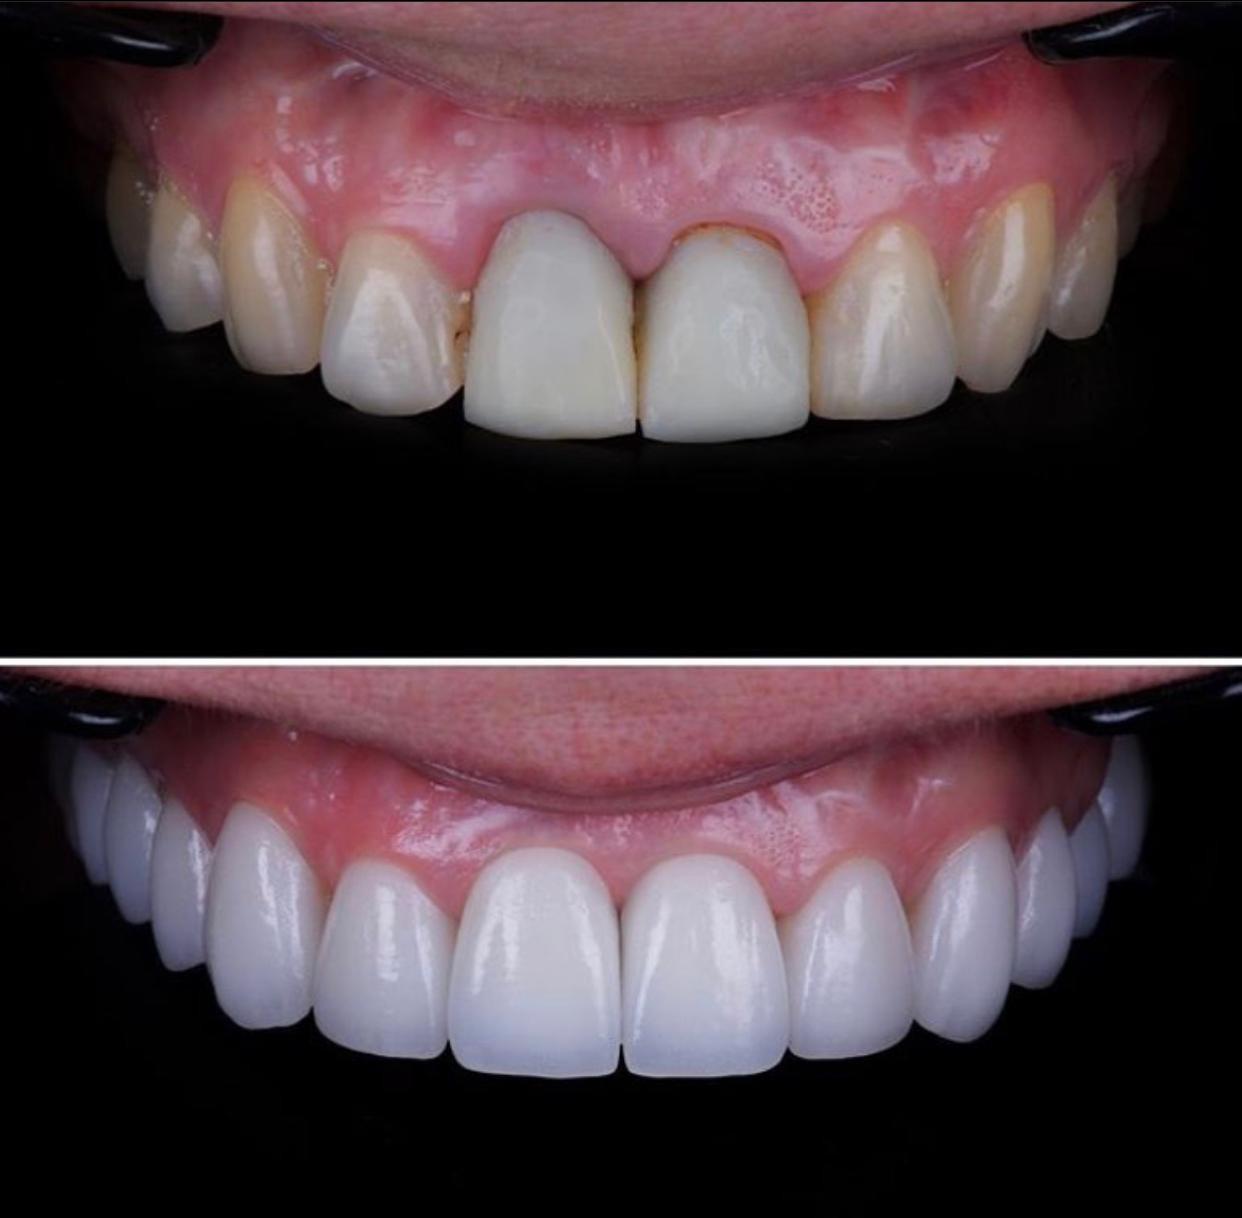 Zahnmedizin / Implants / Veneers / Turkey / Medicterrean